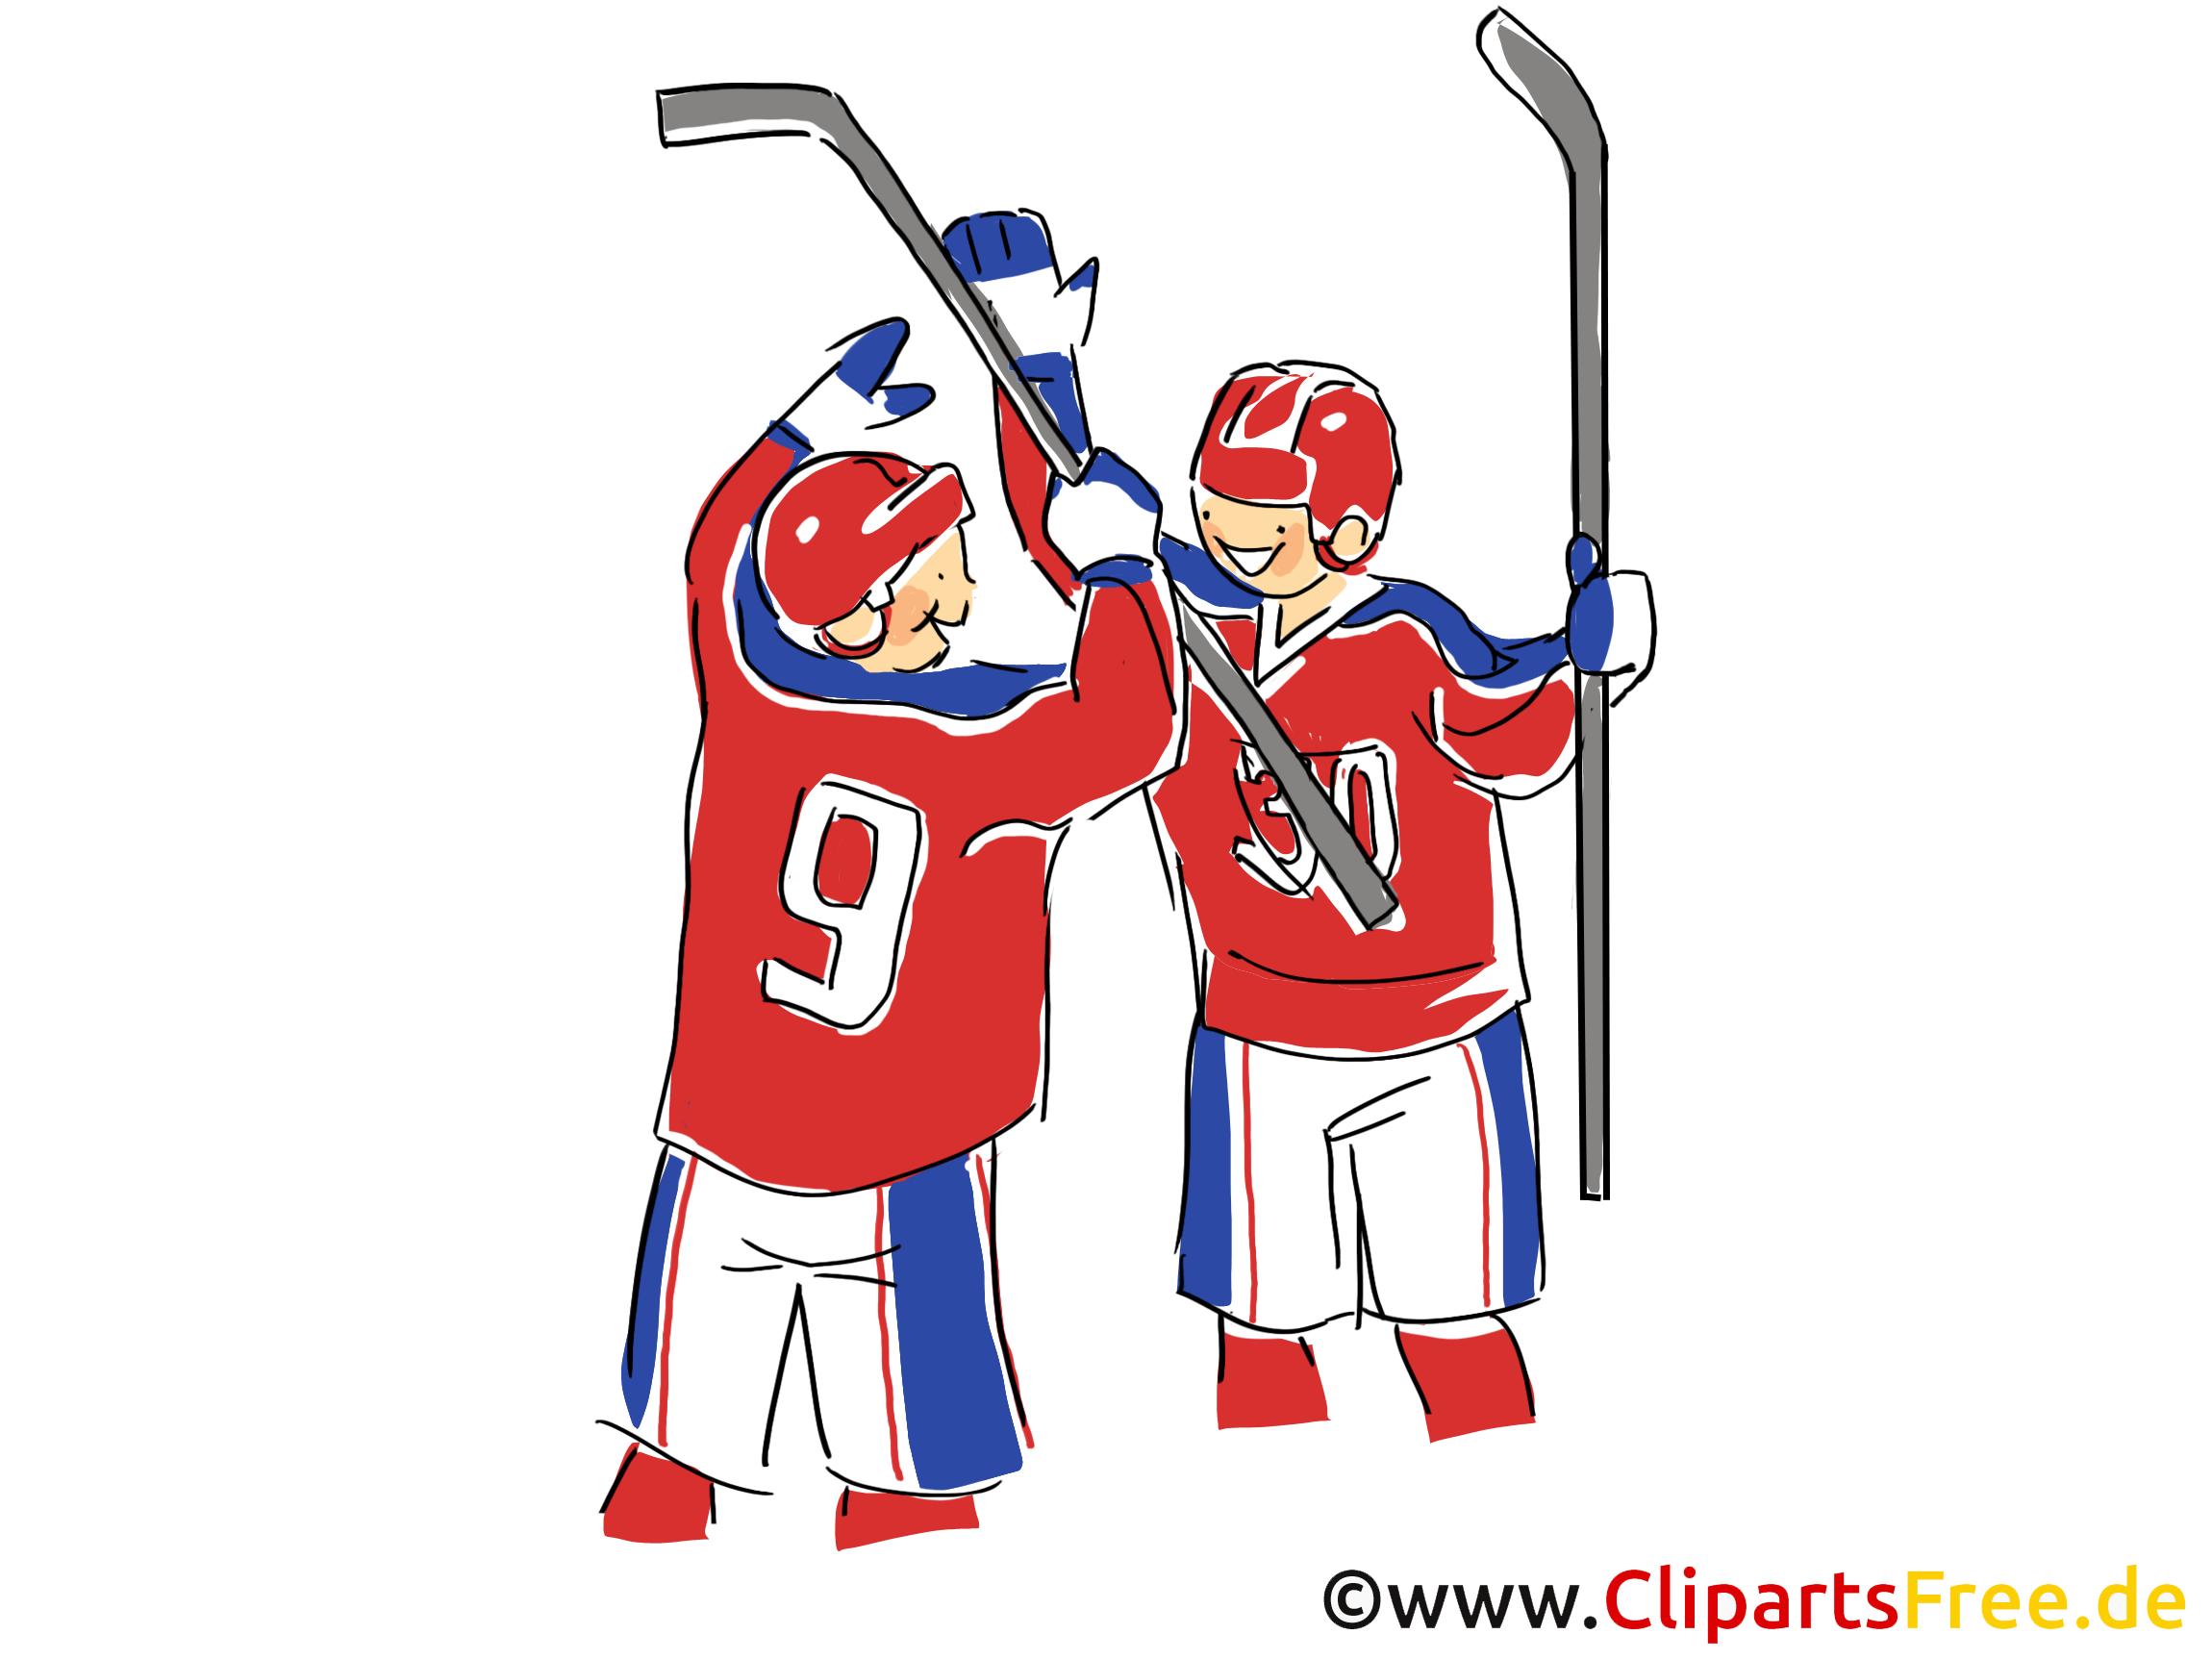 Tor Eishockey Bild, Illustration, Clipart, Comic, Cartoon gratis